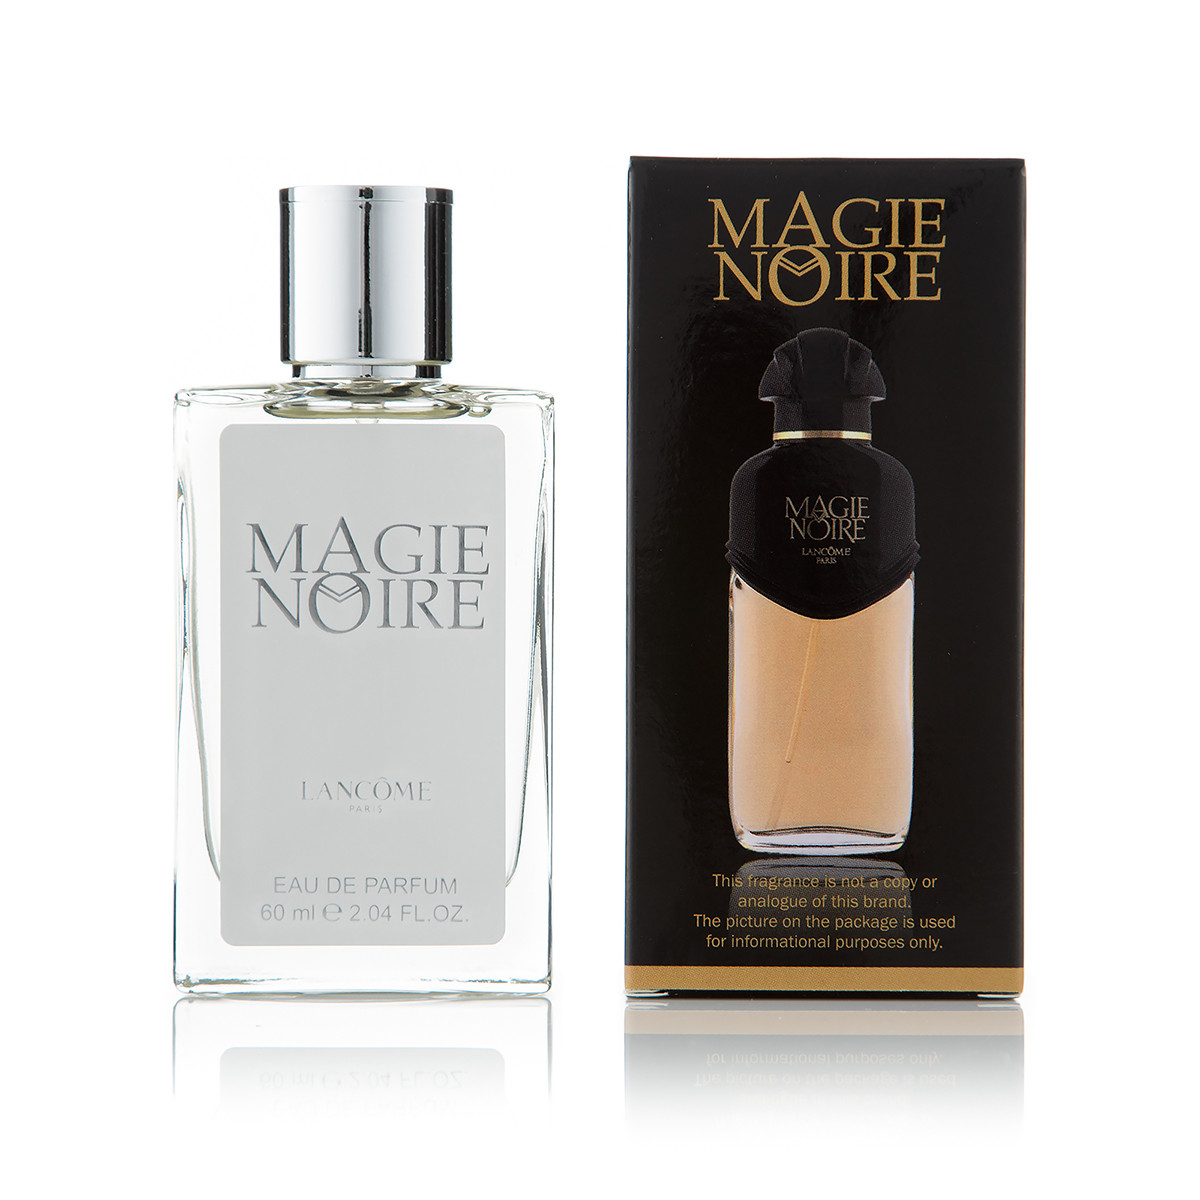 60 мл мини парфюм  Lancome Magie Noire (Ж)